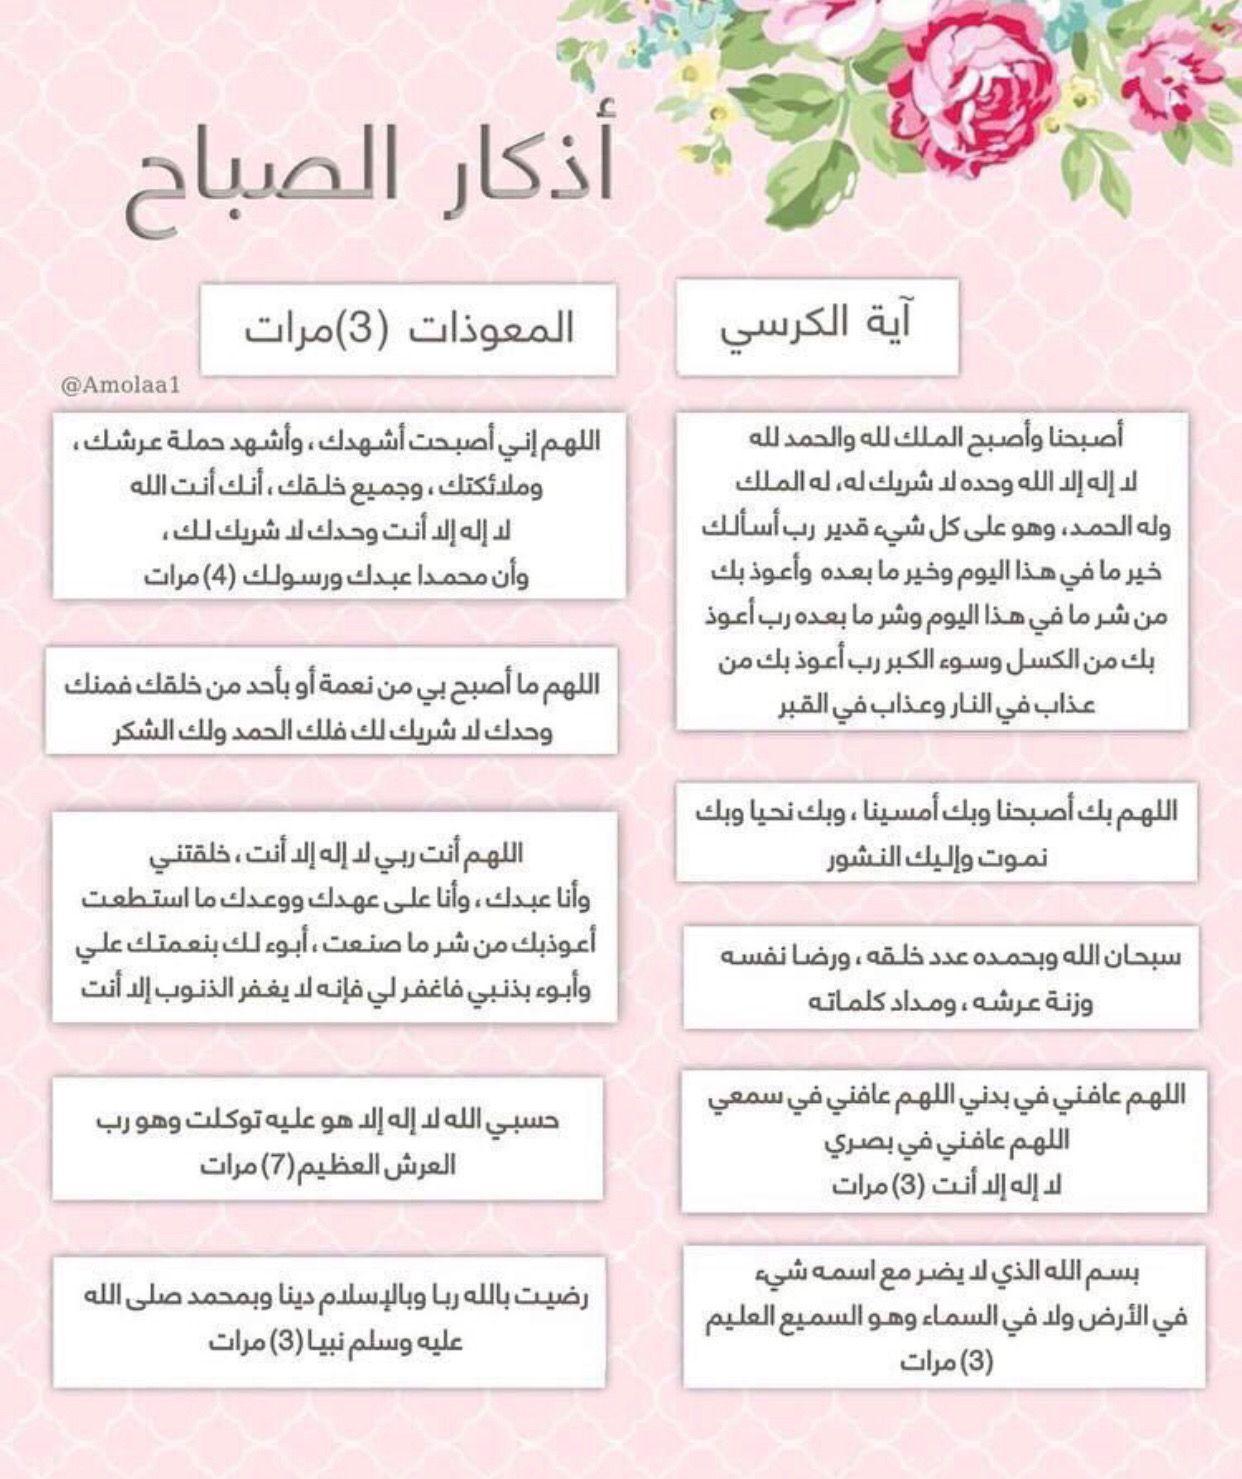 Pin By Nasro Bensnousi On اذكارات Islam Facts Islamic Phrases Islam Beliefs